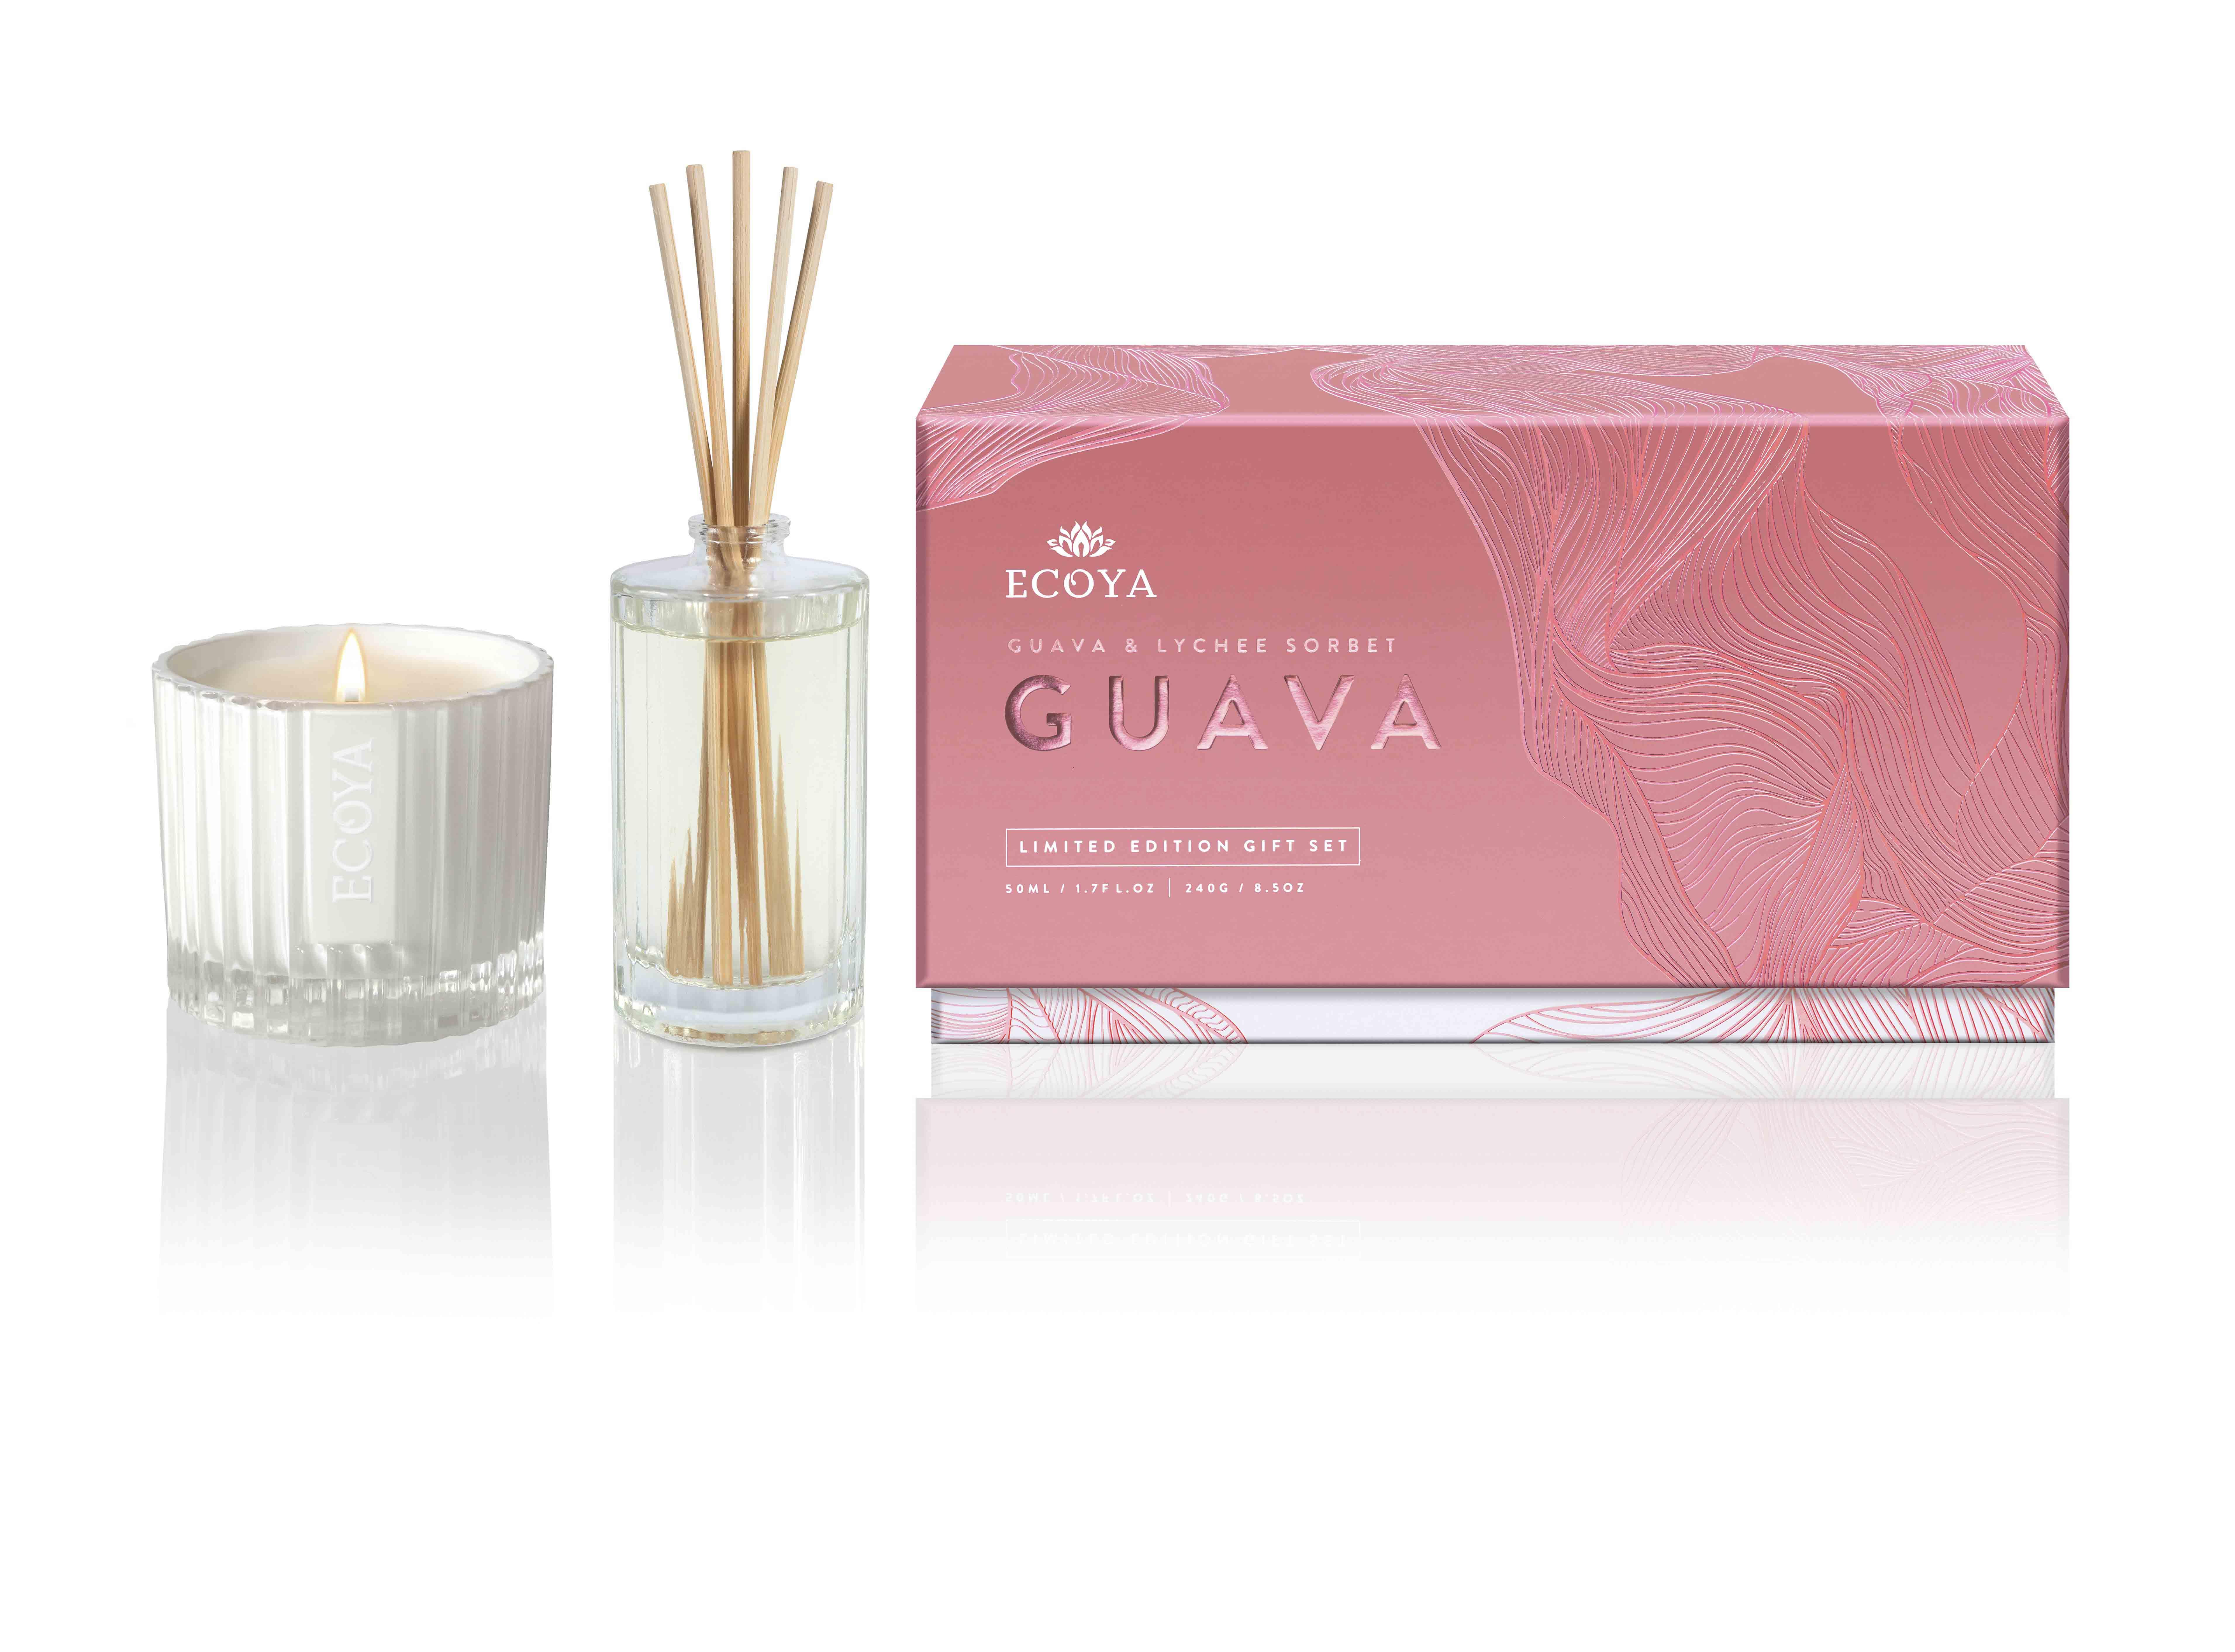 ecoya-limited-edition-gift-set-%c2%ad-guava-lychee-sorbet-44-95au-or-54-95nz